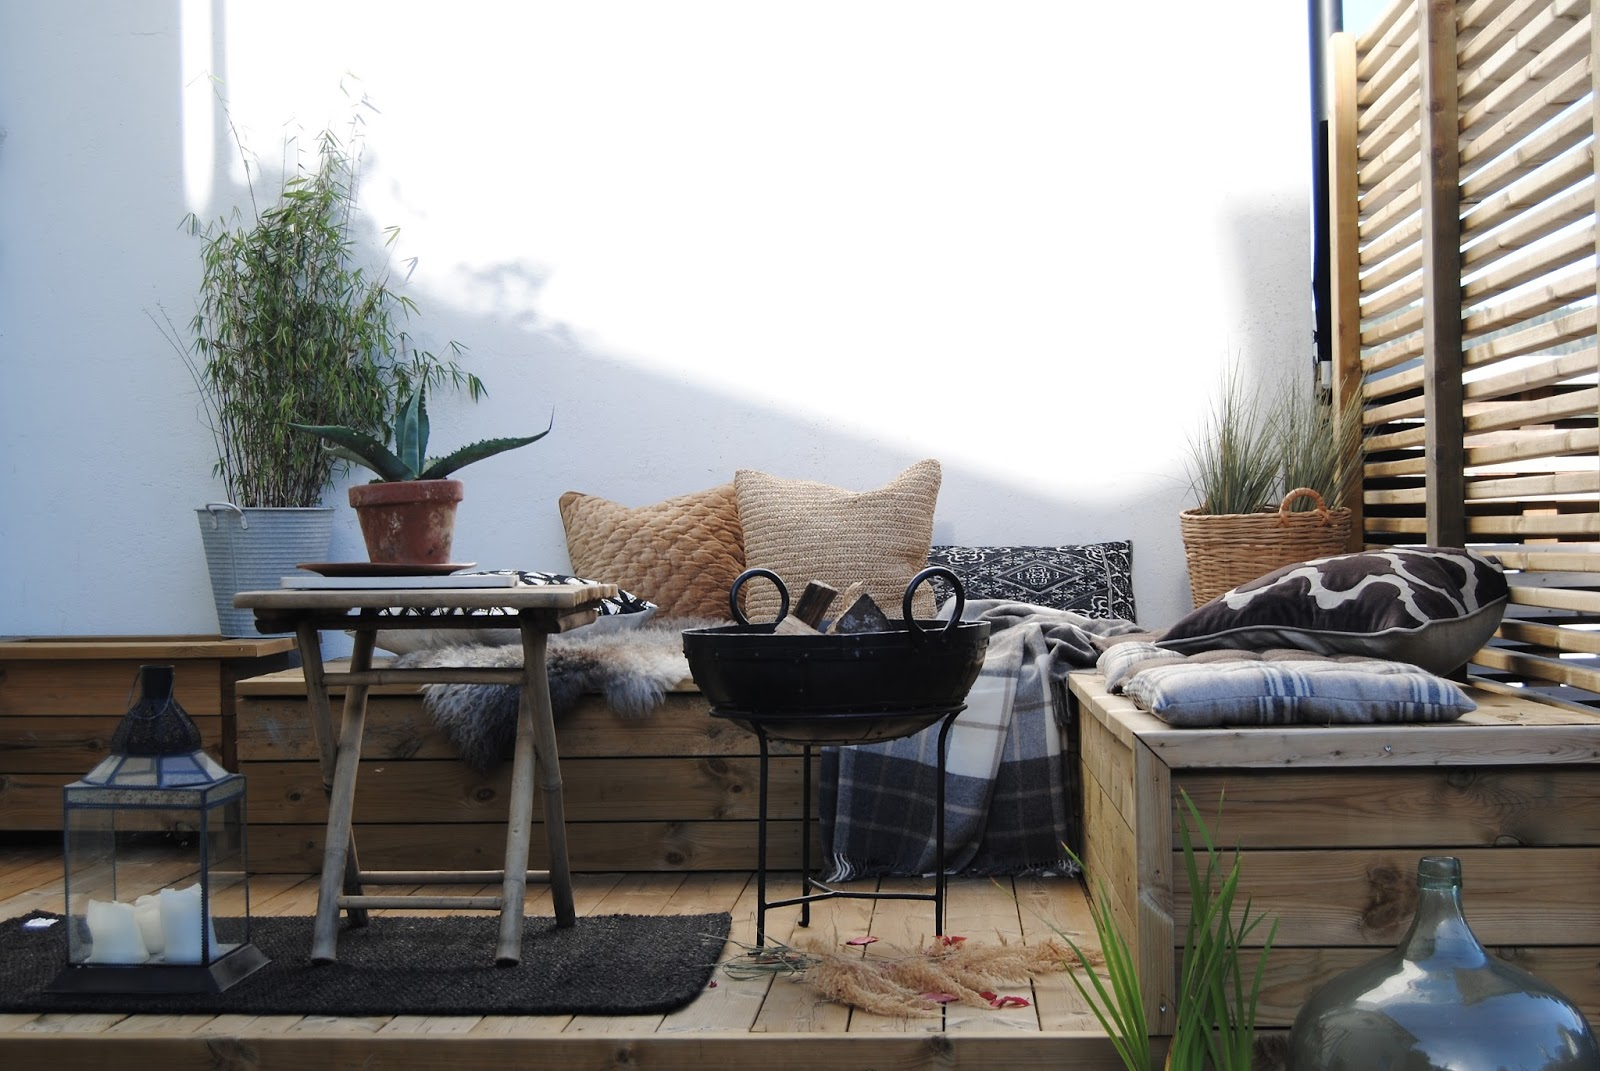 Blogg home and cottage: innred uteplassen